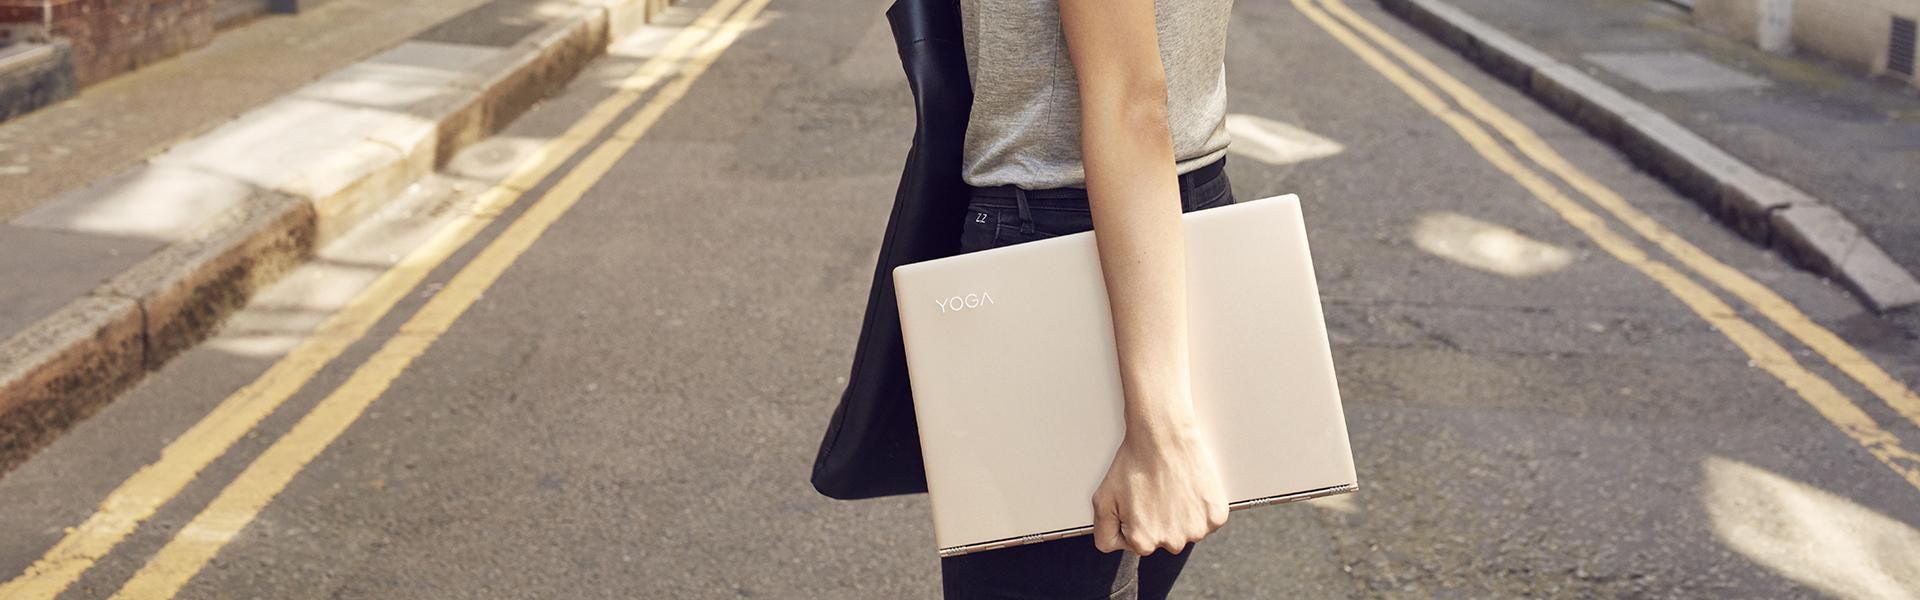 YOGA 5  Pro